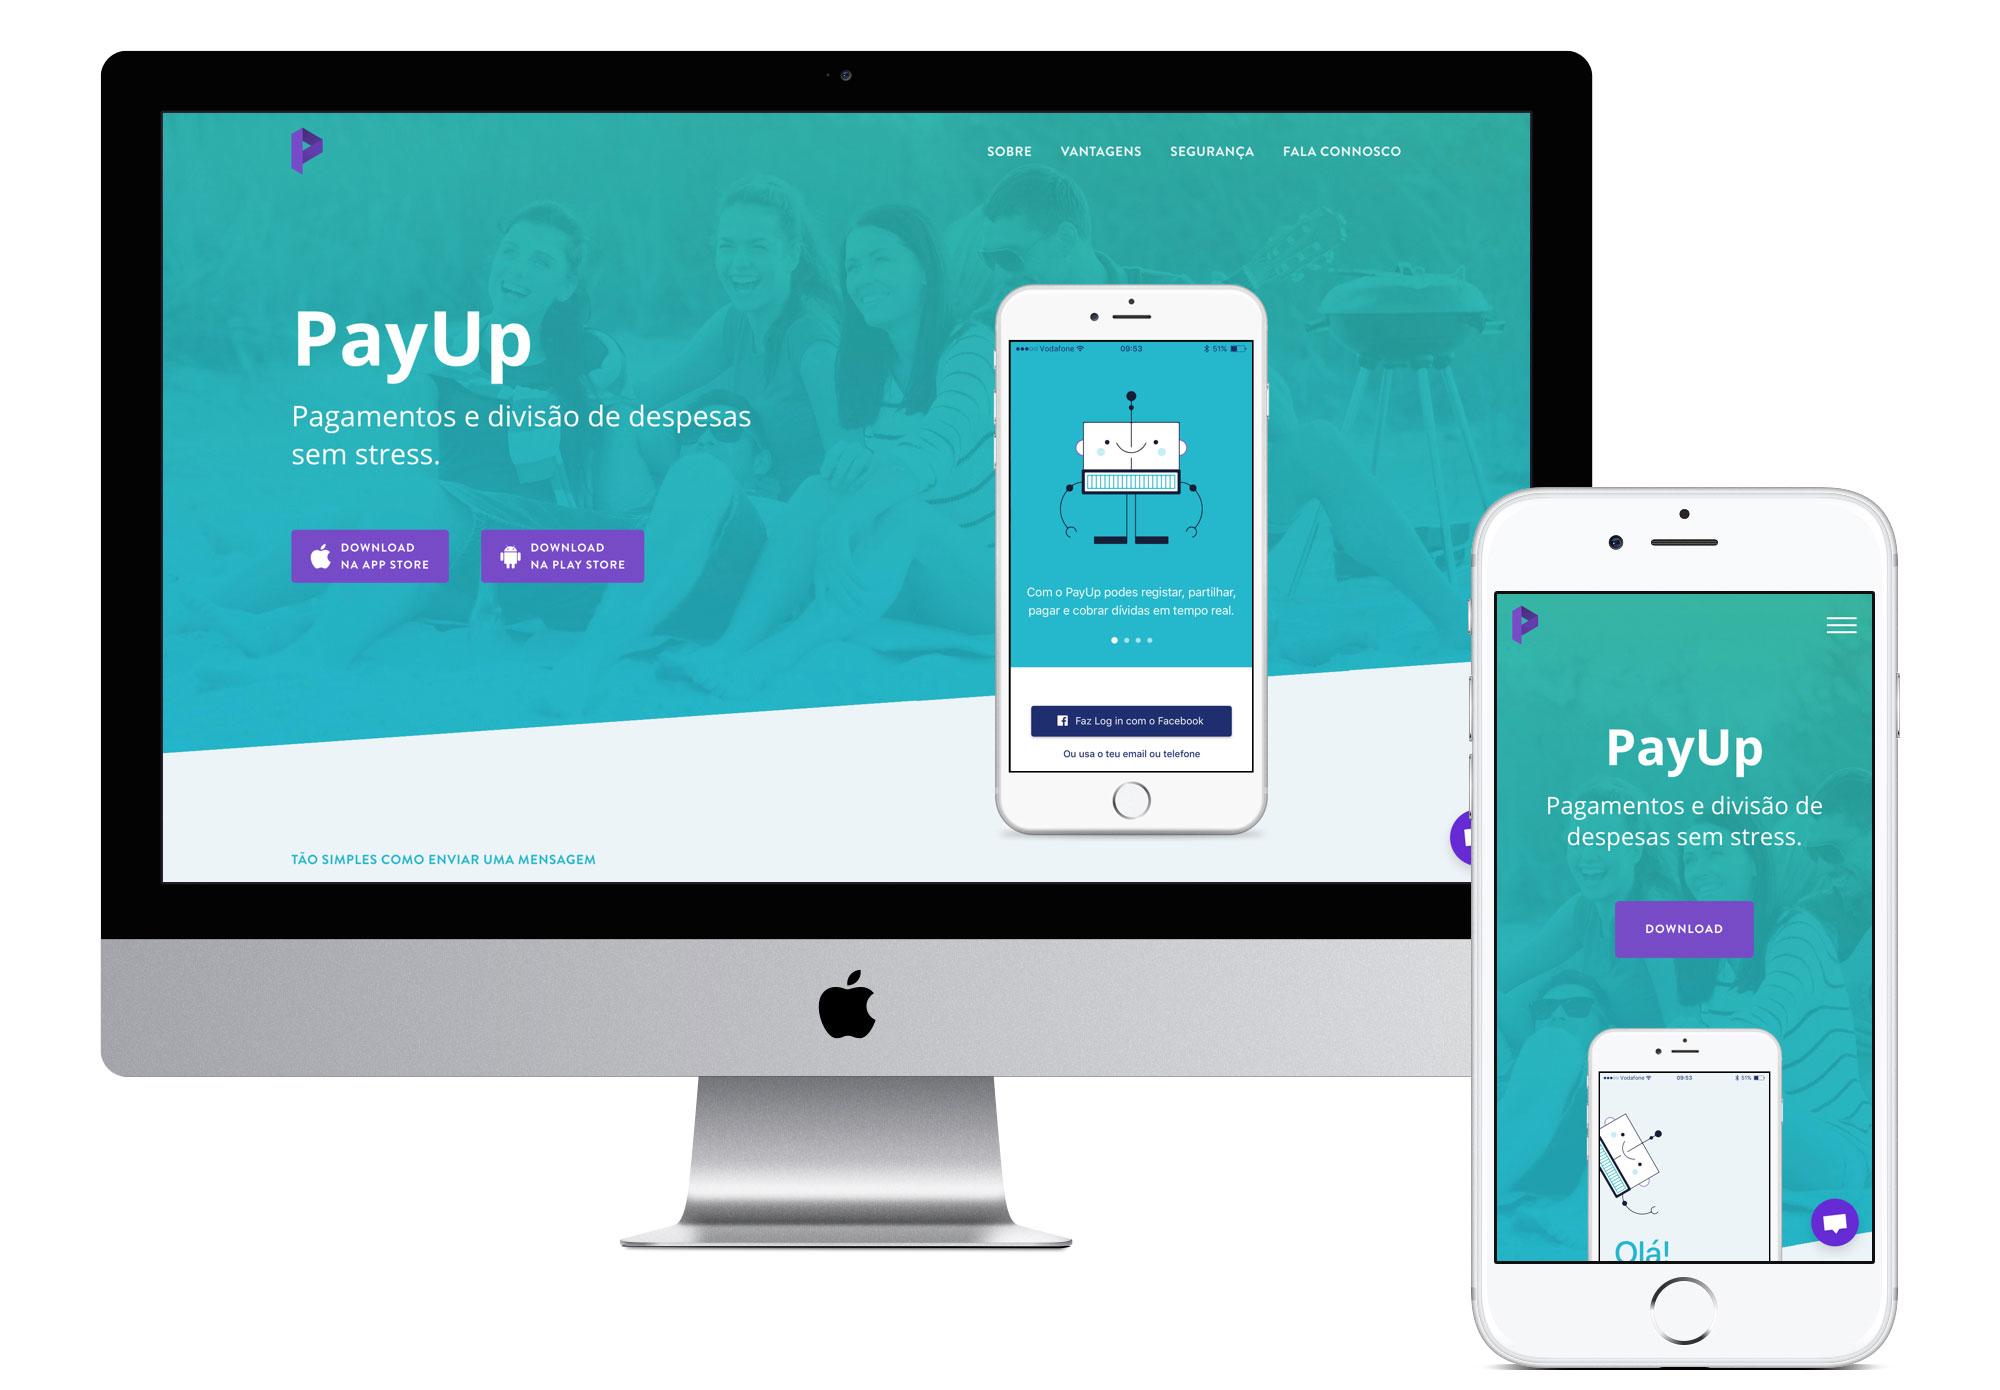 GitHub - FilipaGo/payup-desktop-site-prototype: 💶 PayUp App Landing